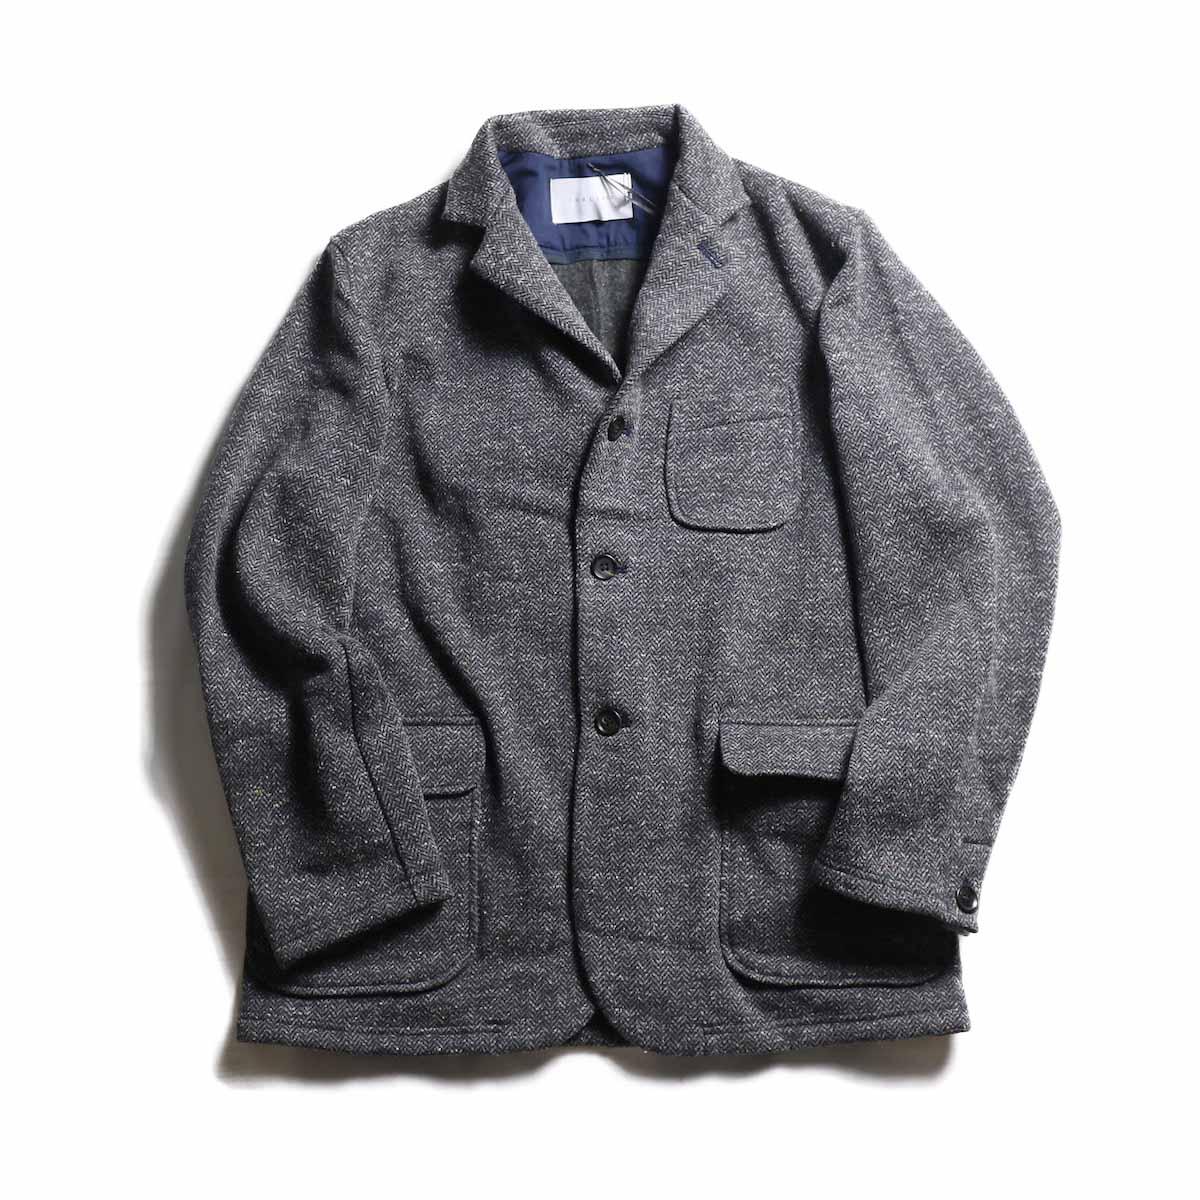 CURLY / Bleecker HB Jacket -NAVY HB